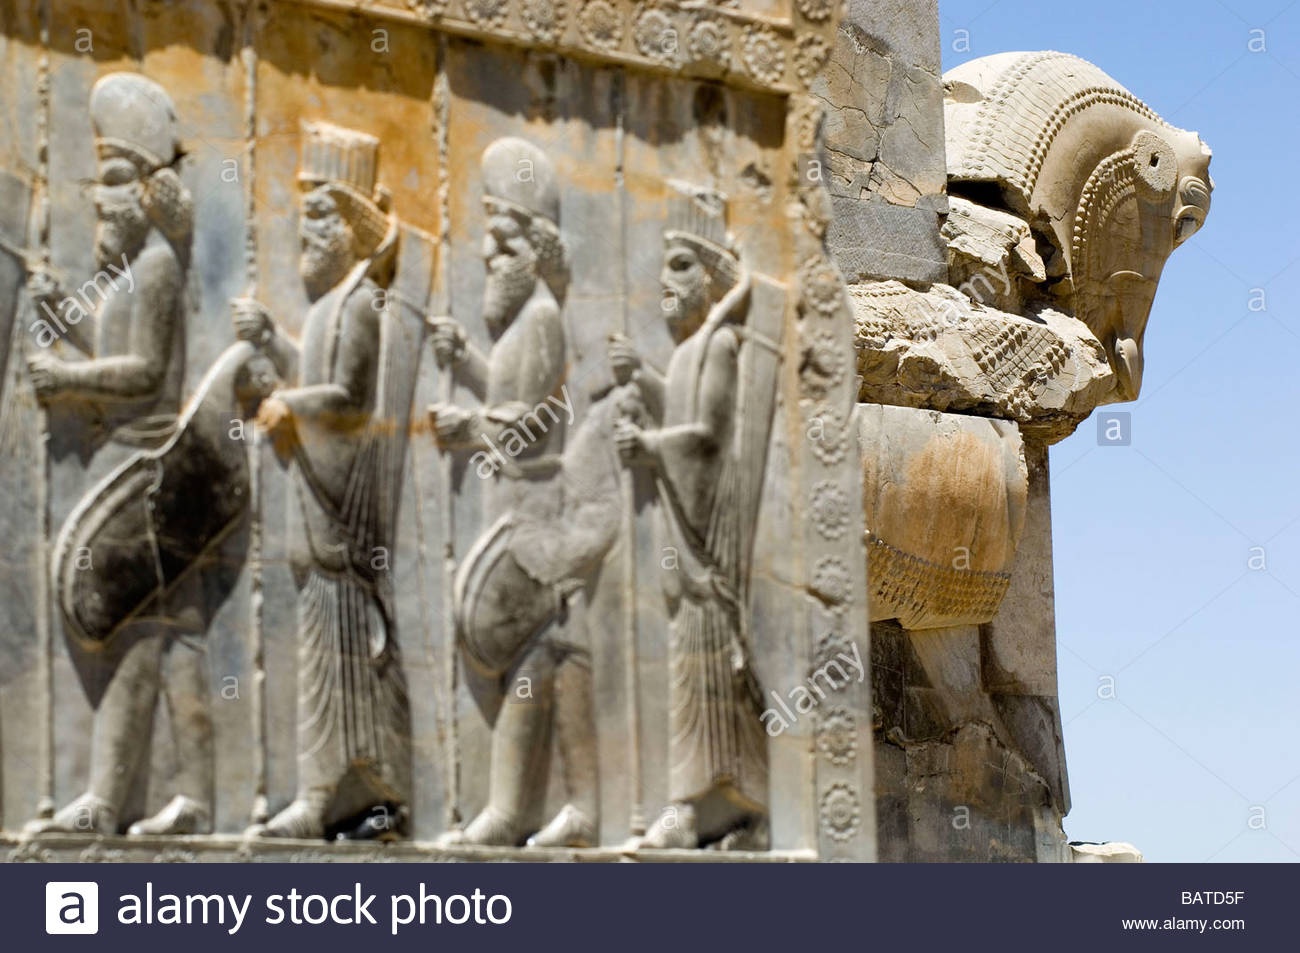 Bas-reliefs - Ruins of the Persian empire Persepolis,Iran - Stock Image